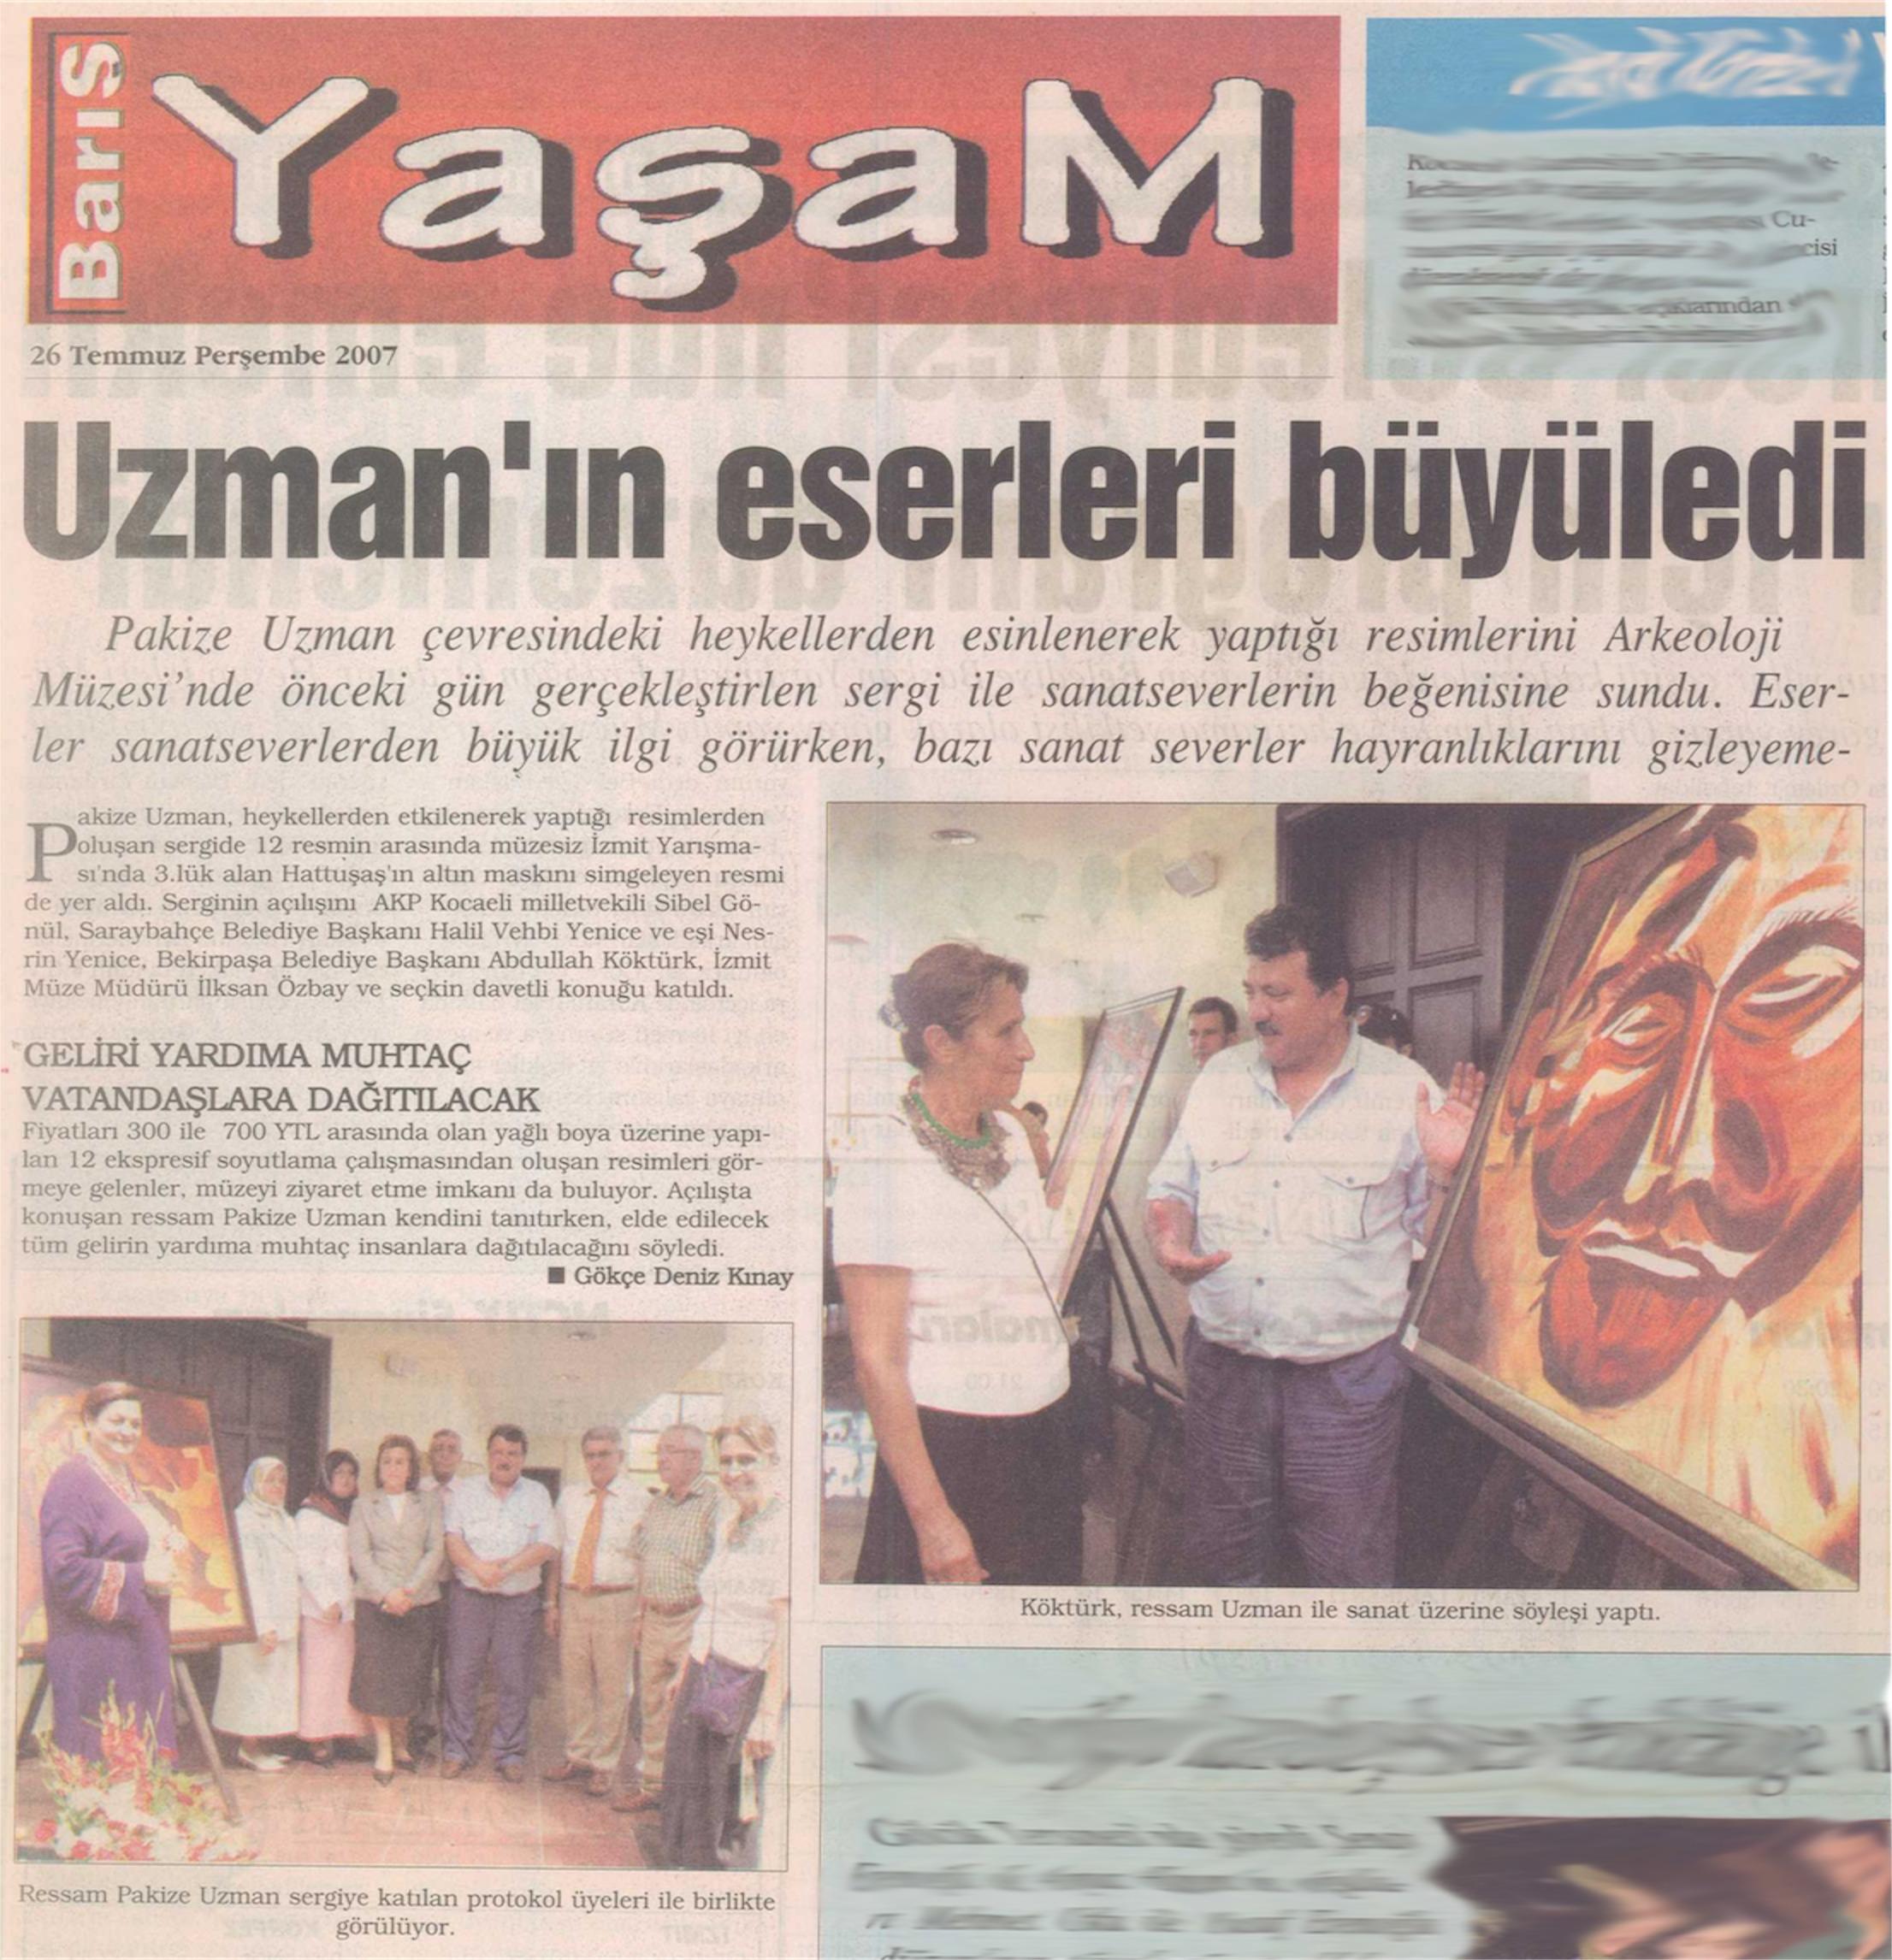 HOME PAKİZEUZMAN EXHIBITIONS PRESS CONTACT